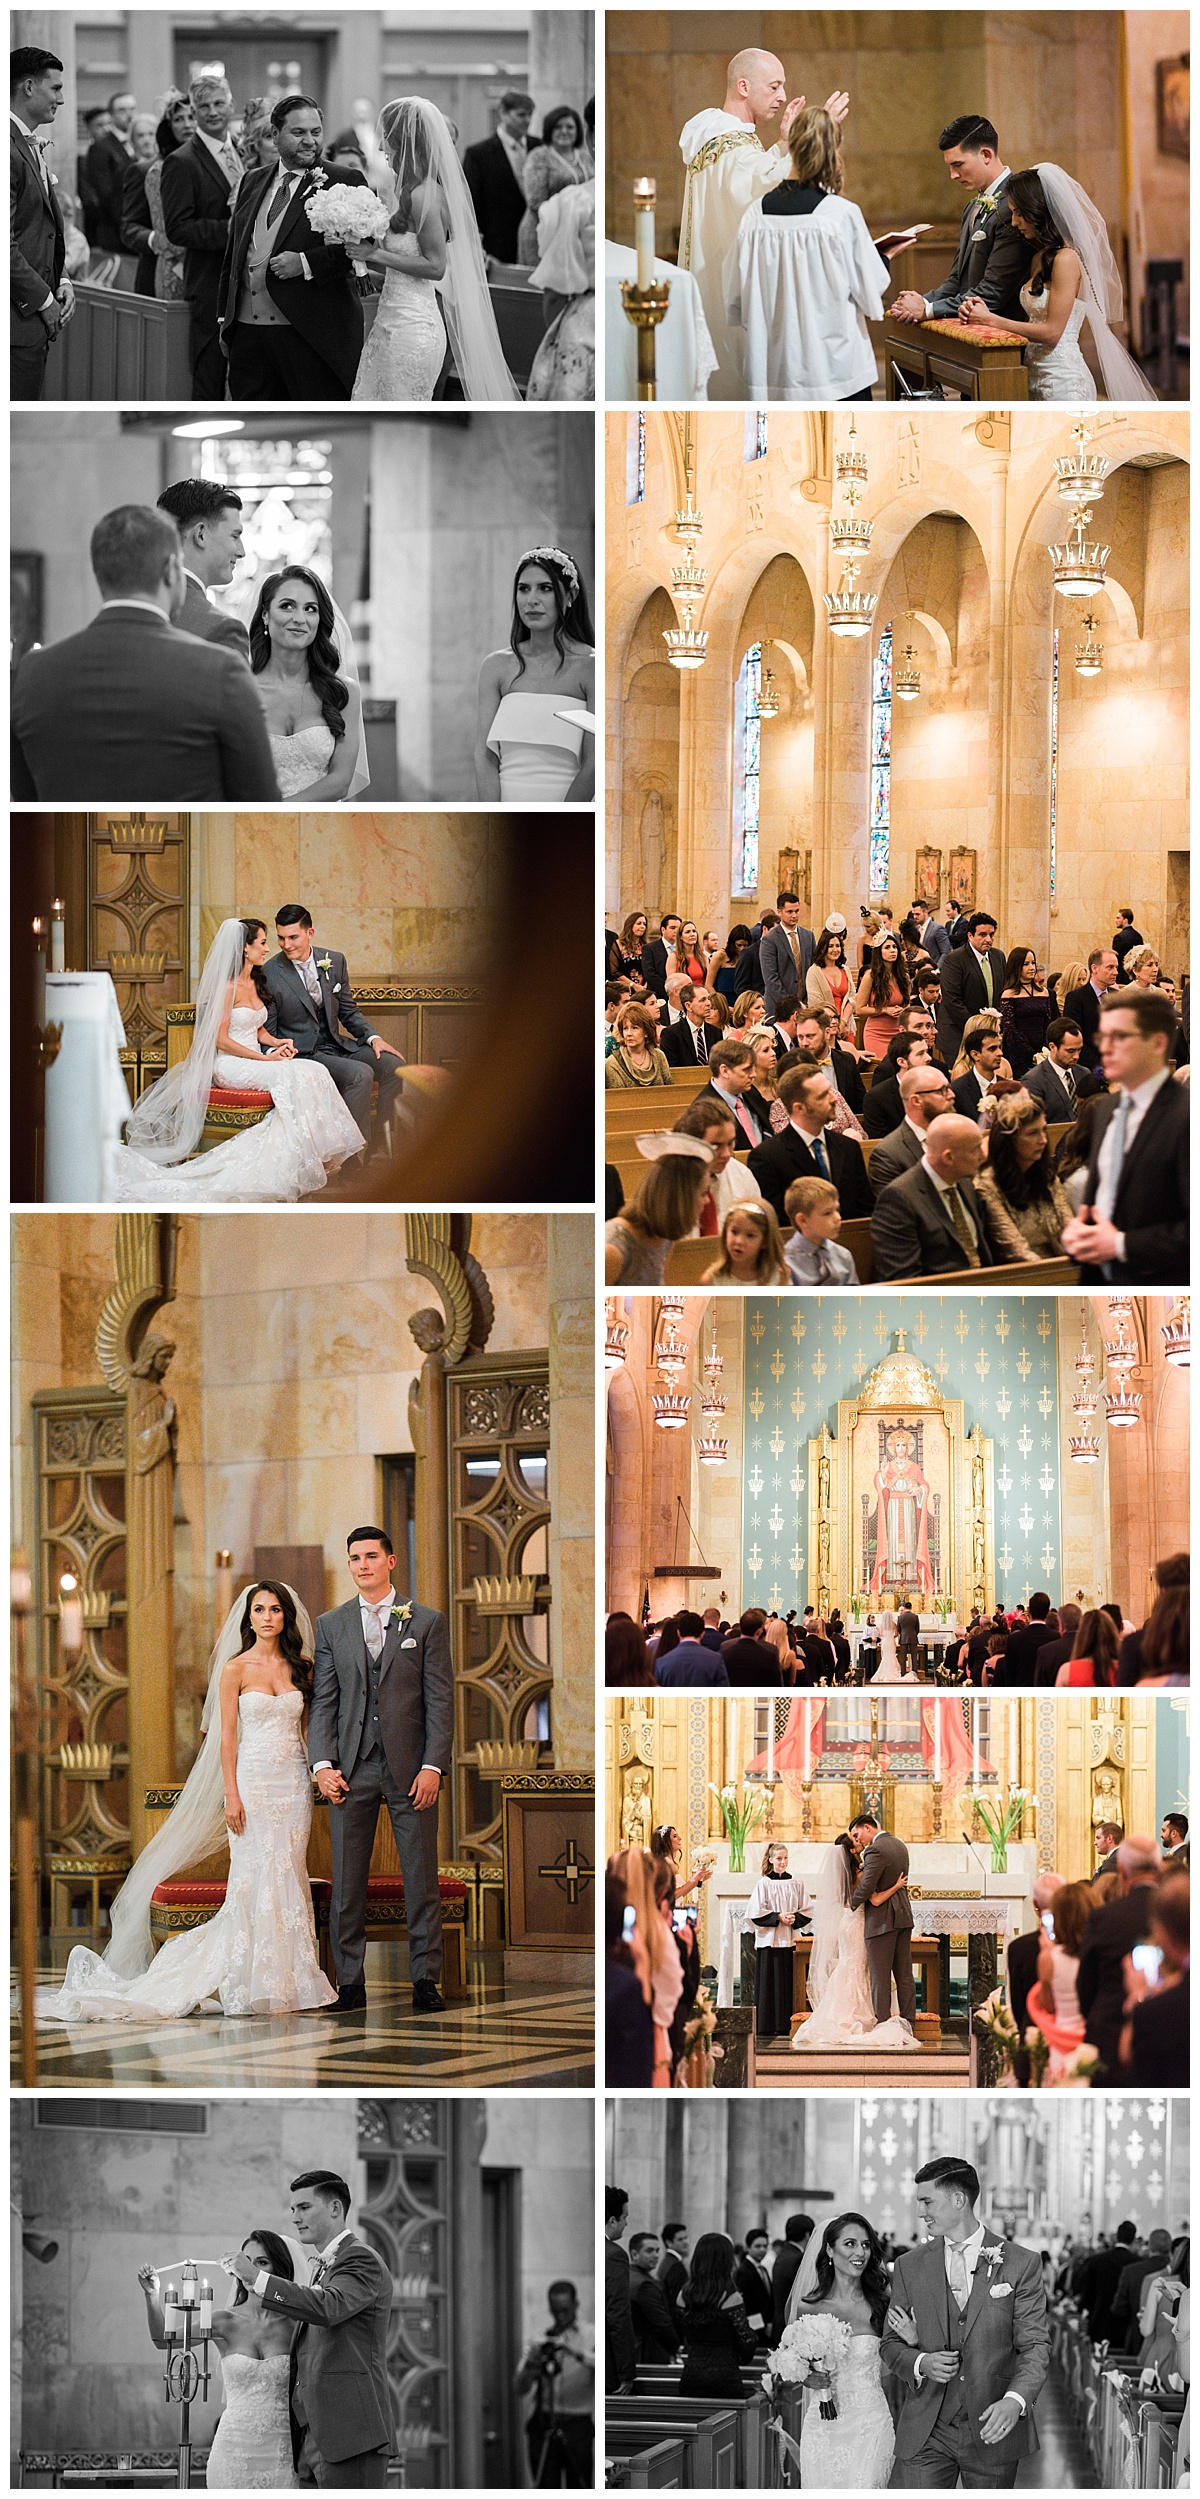 christ-the-king-catholic-church-wedding-ar-photography-5.jpg